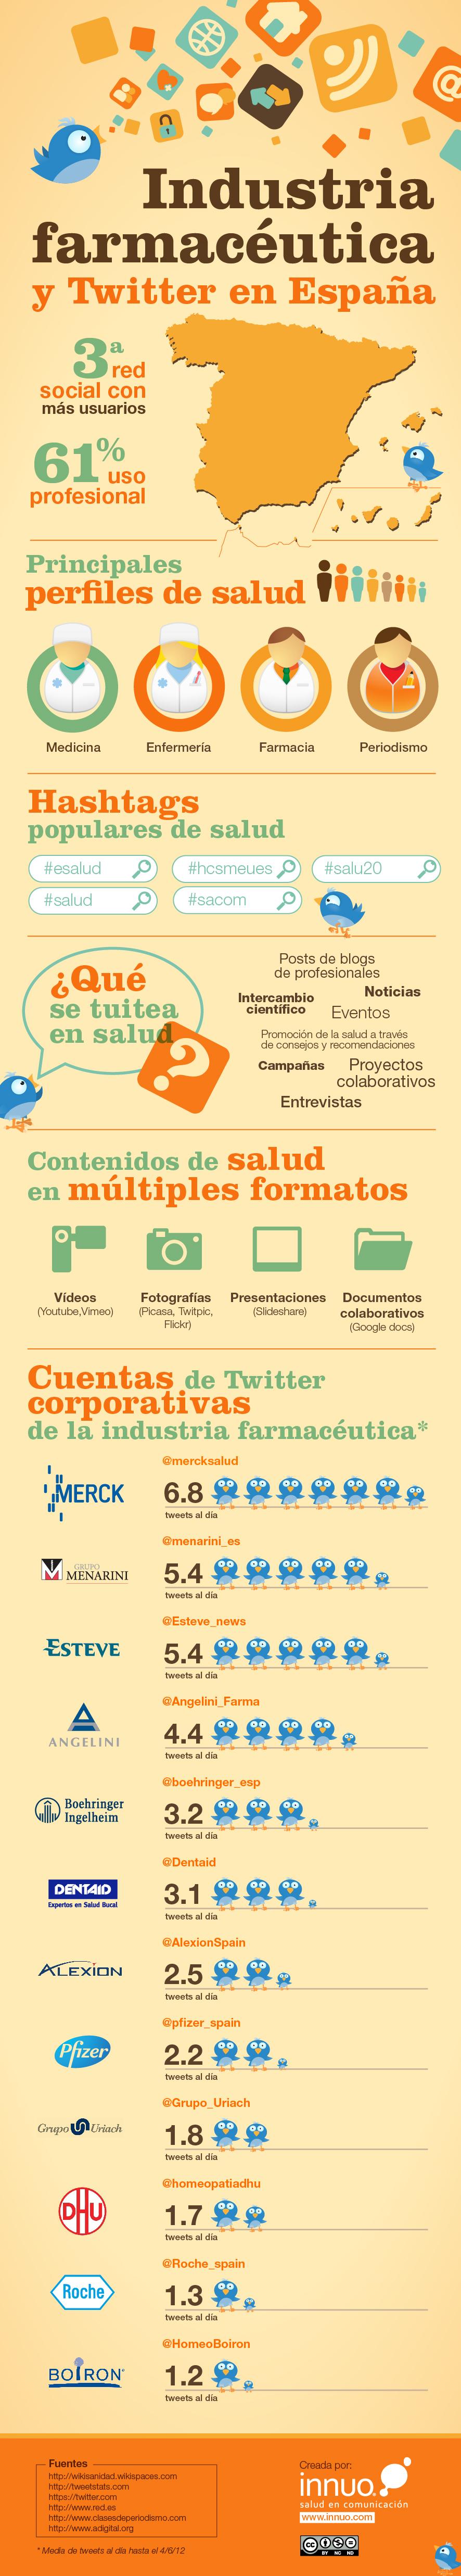 Infografia_Twitter_Industria-Farmacuetica